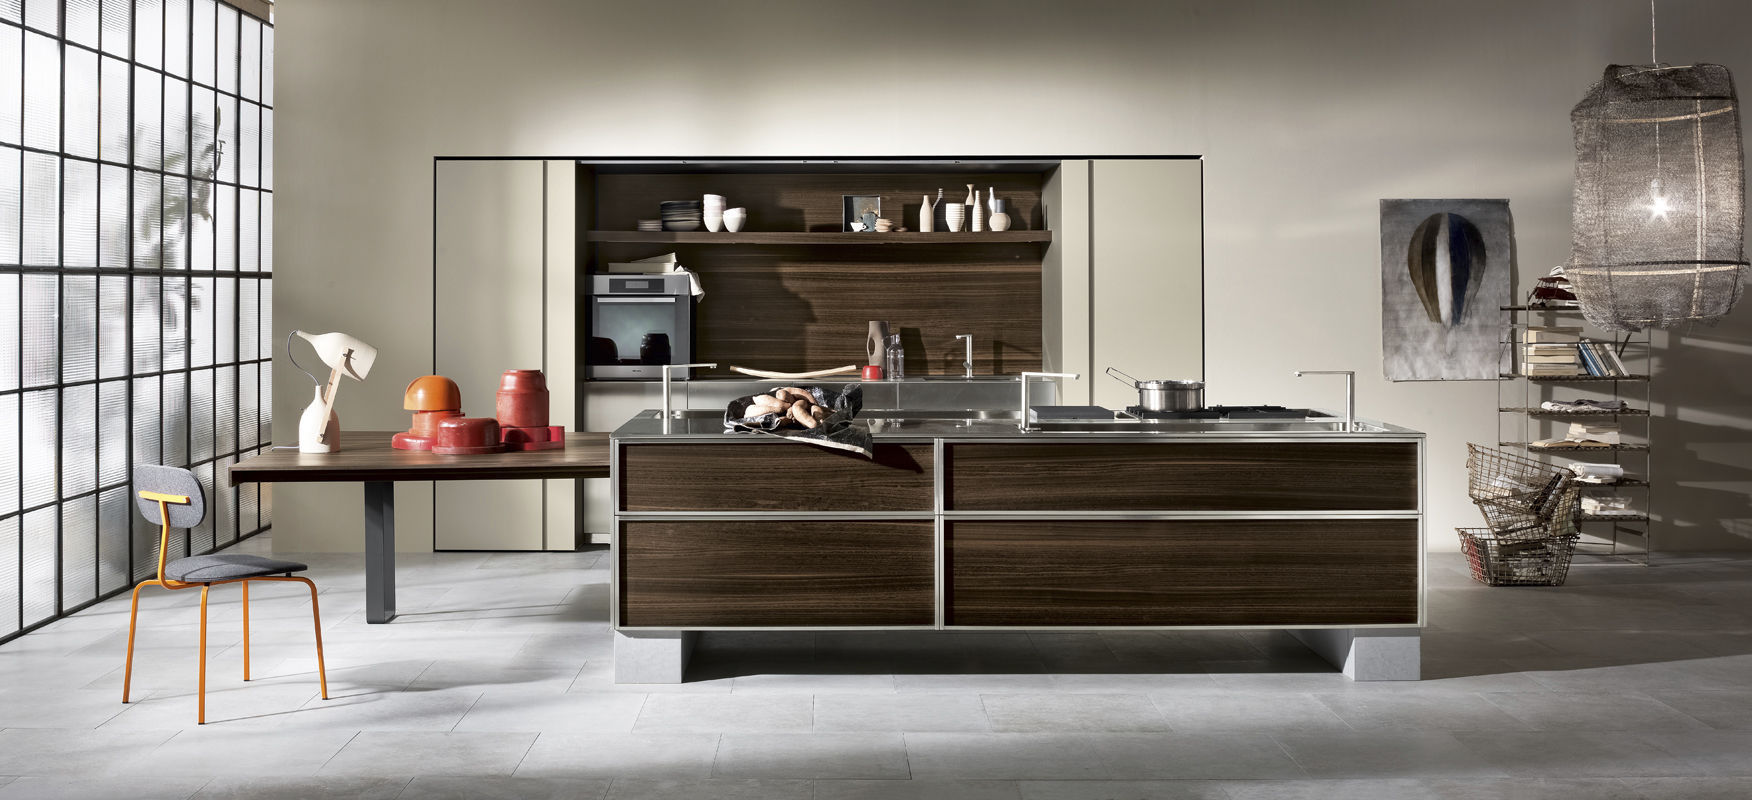 Moderne küche aus edelstahl holzfurnier versteckte tk38 by massimo castagna rossana